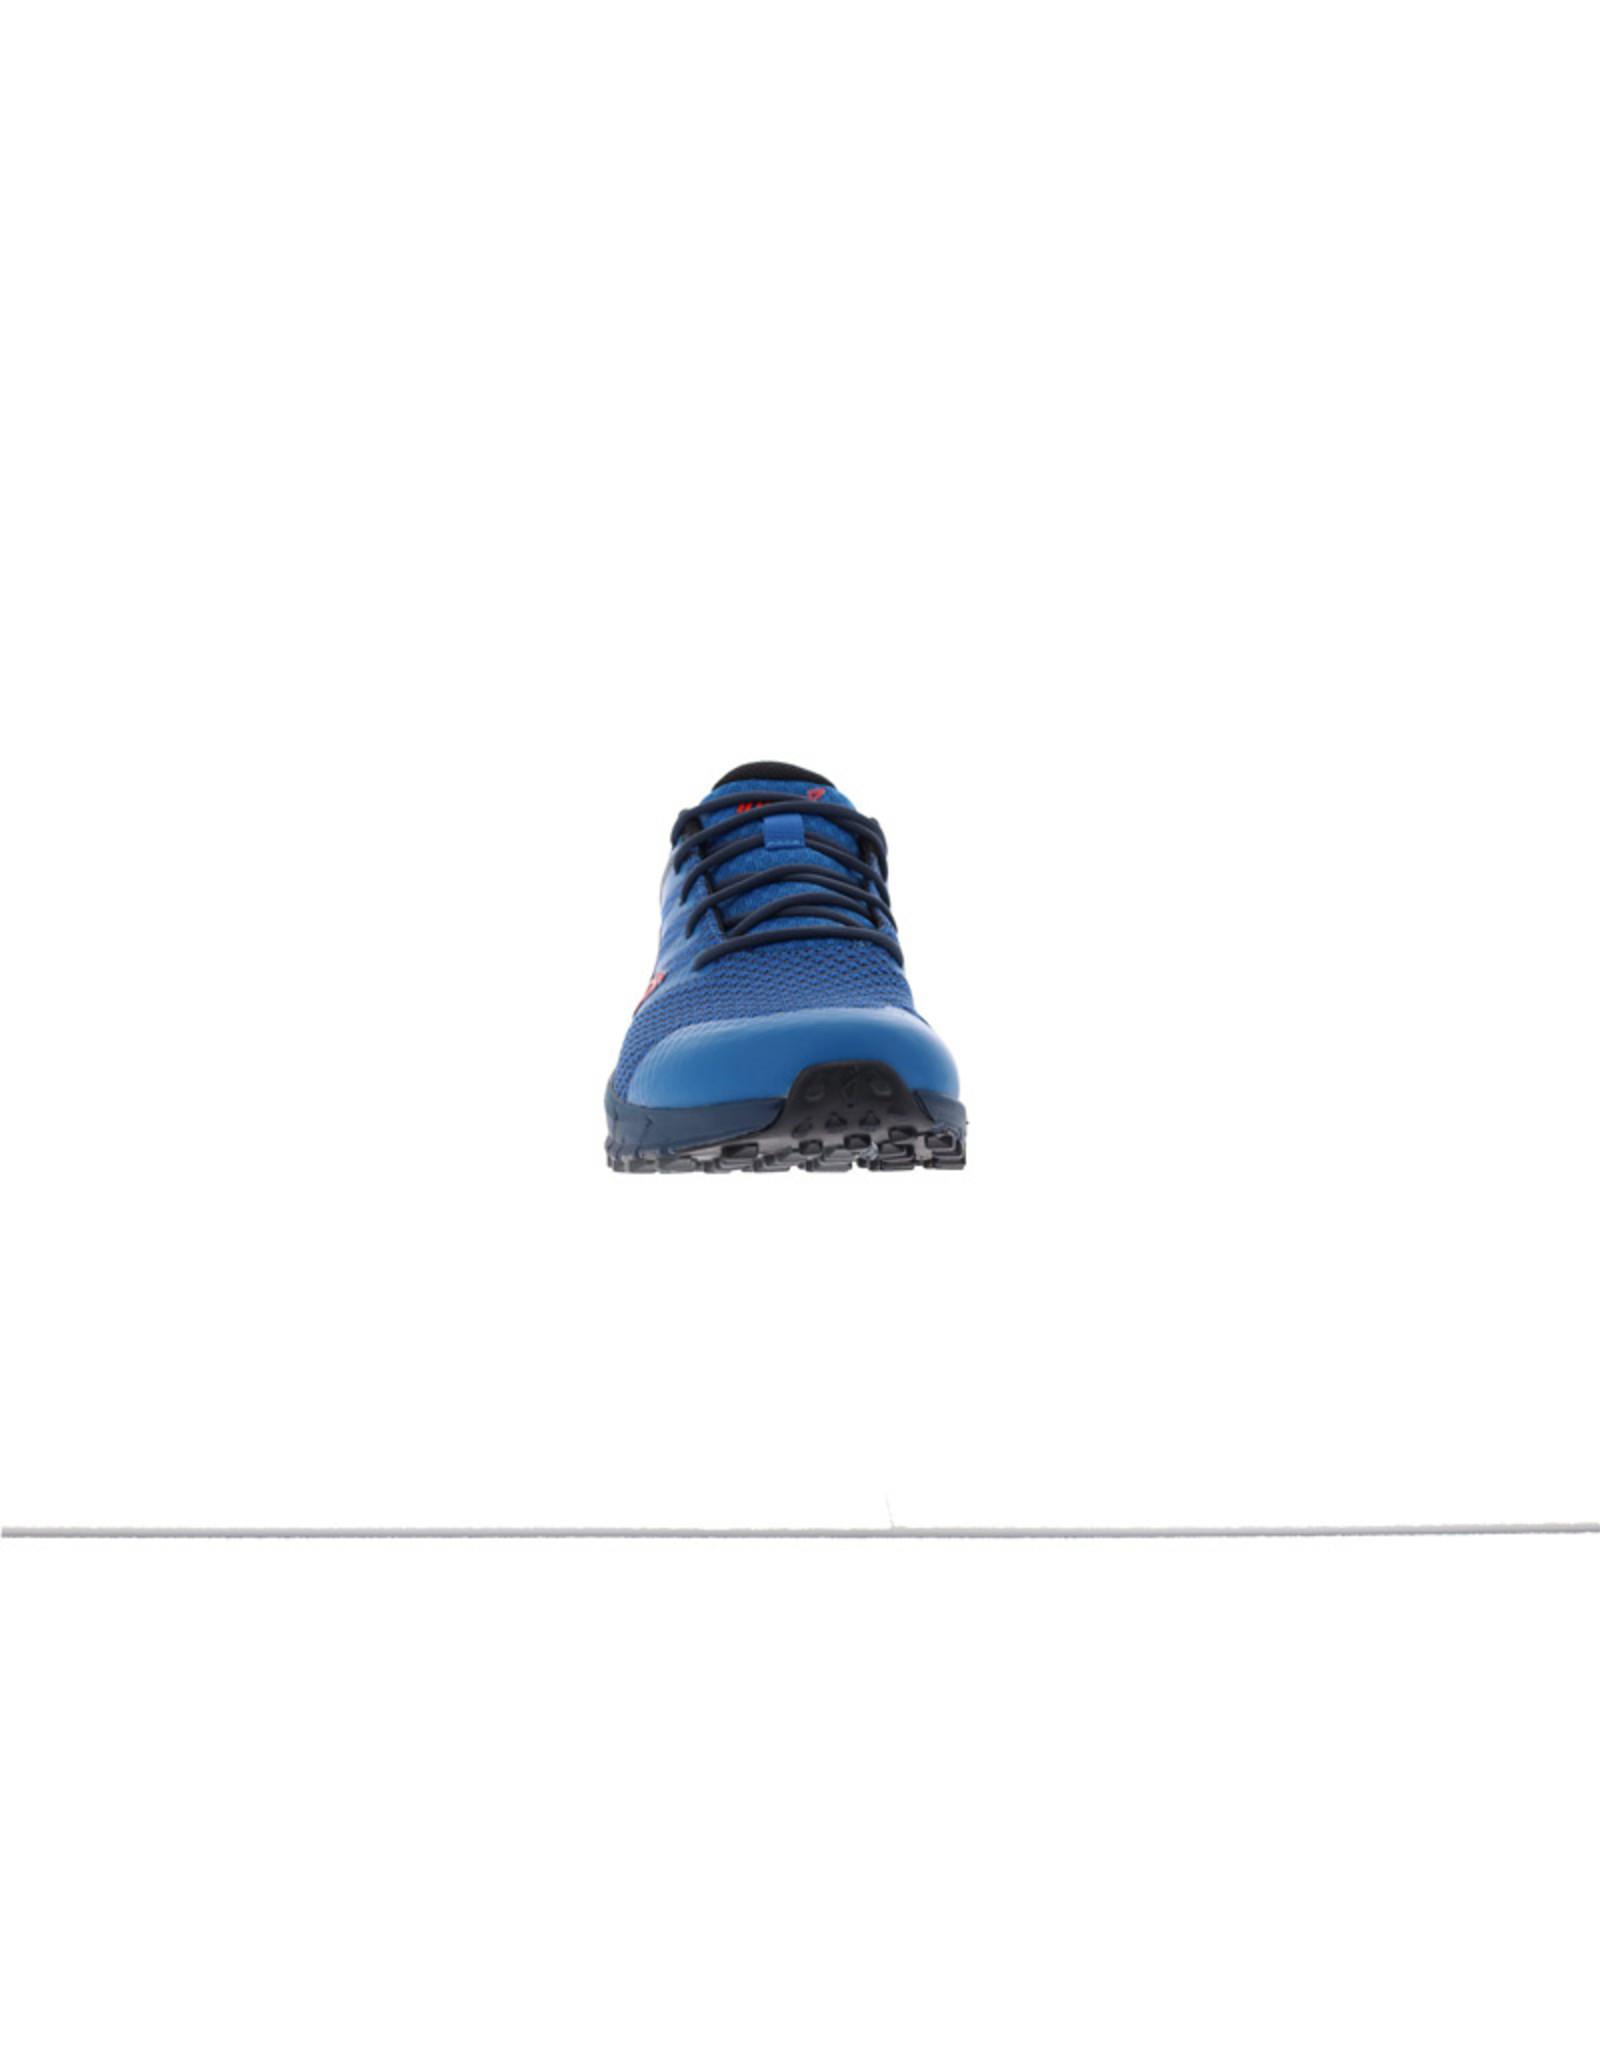 Inov-8 Parkclaw 260 Knit Trailrunning Schoen - Blauw/Rood